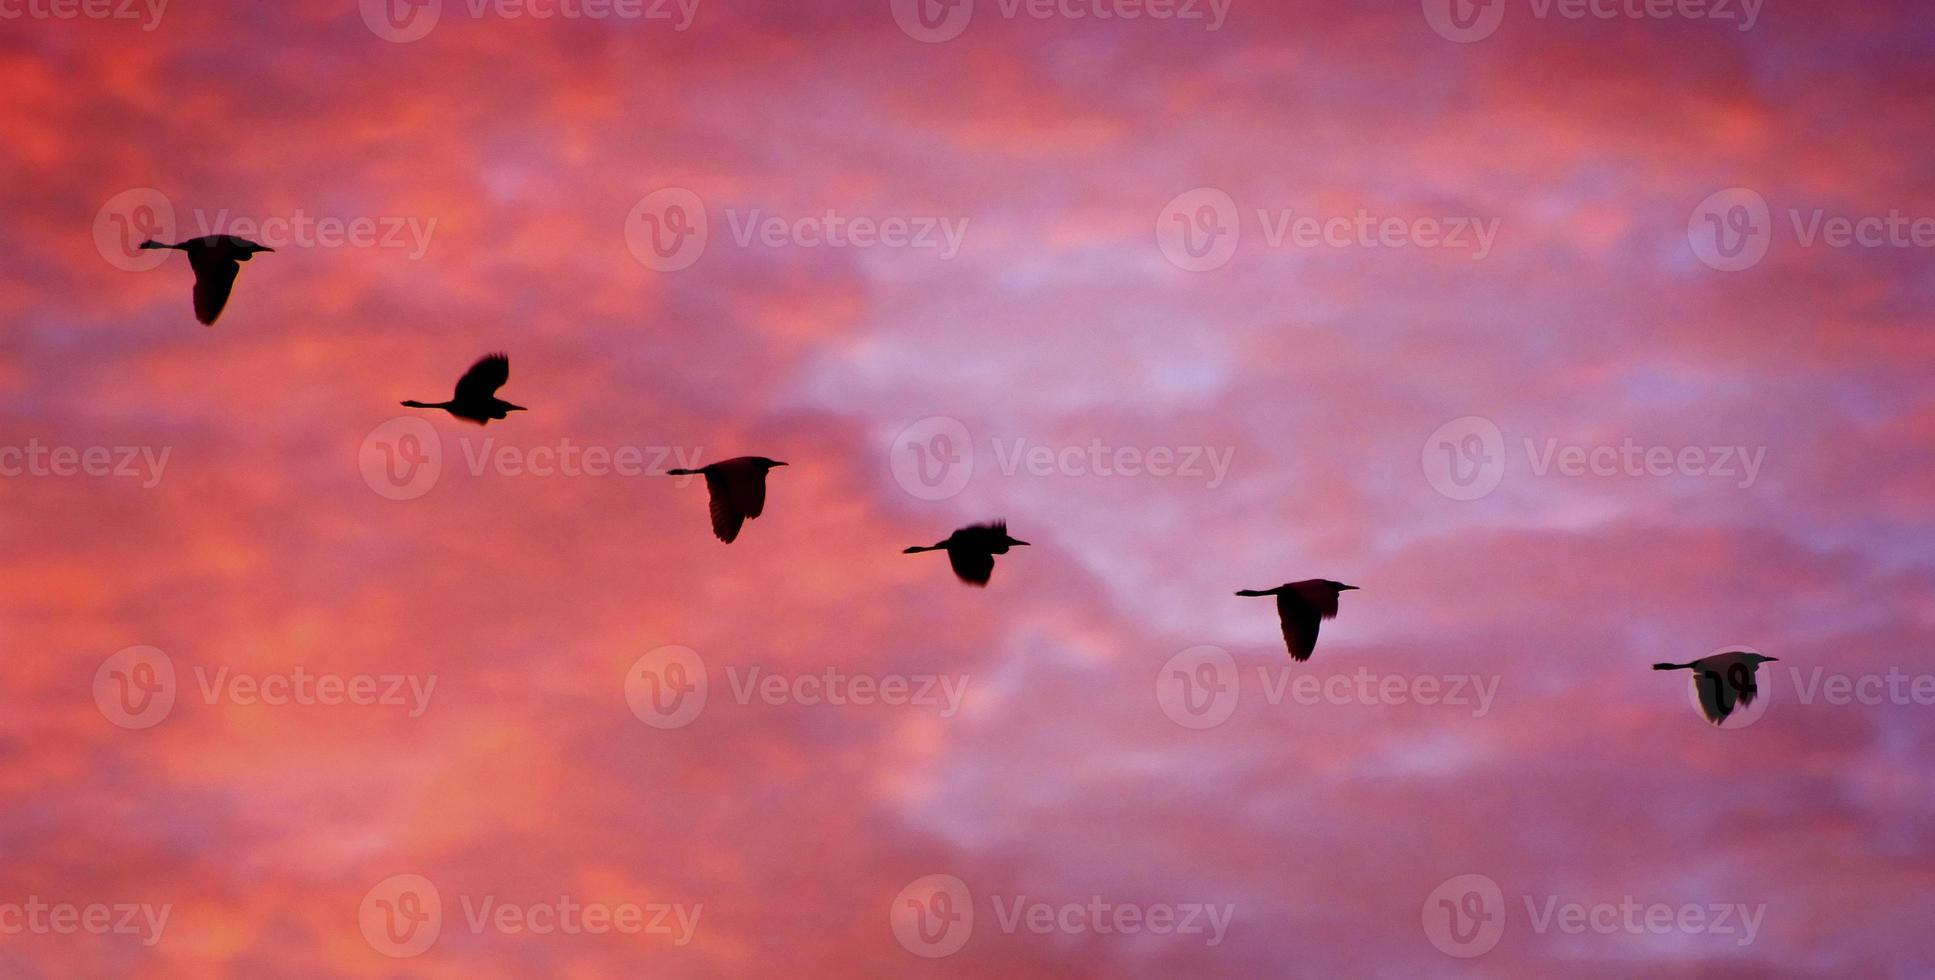 Garzas en vuelo al atardecer foto